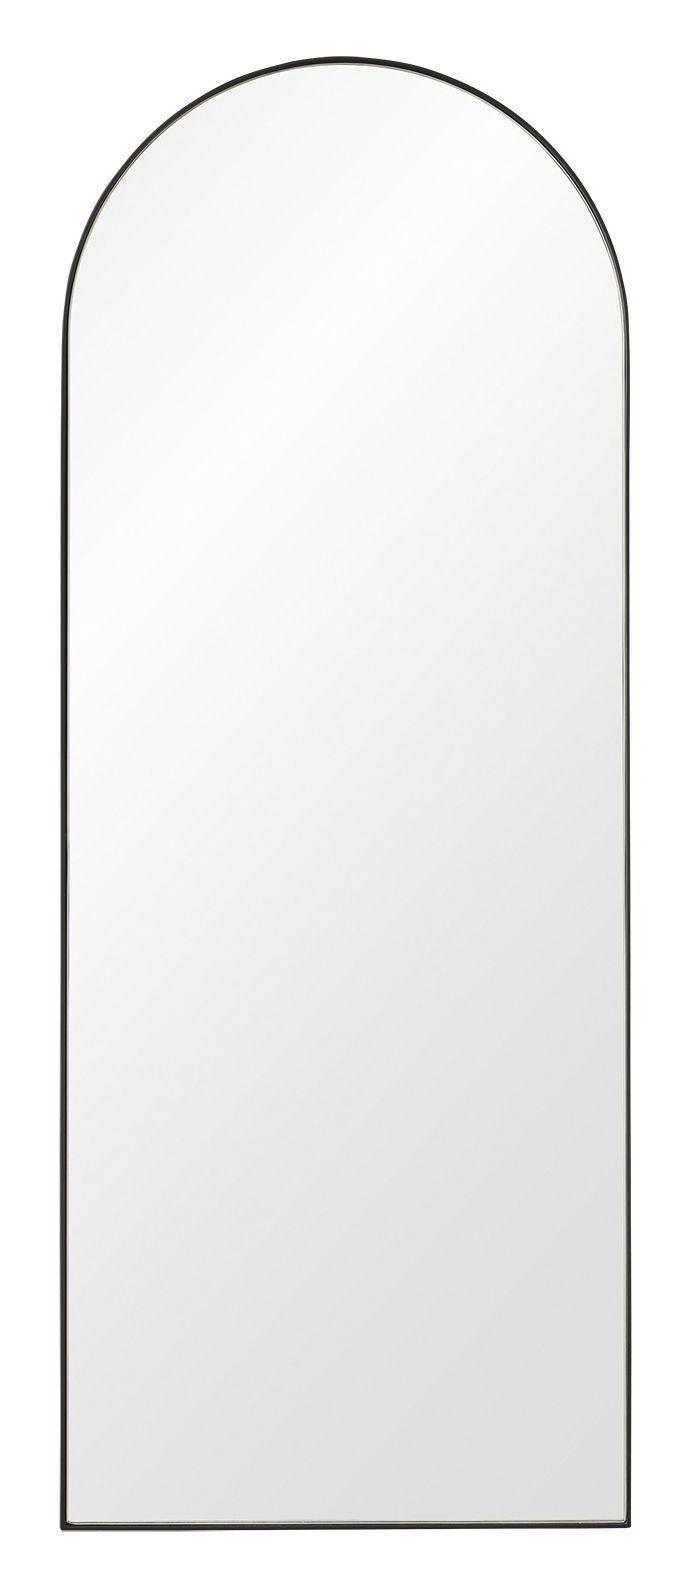 AYTM ARCUS Speil - Svart Ramme, 90x35   Unoliving